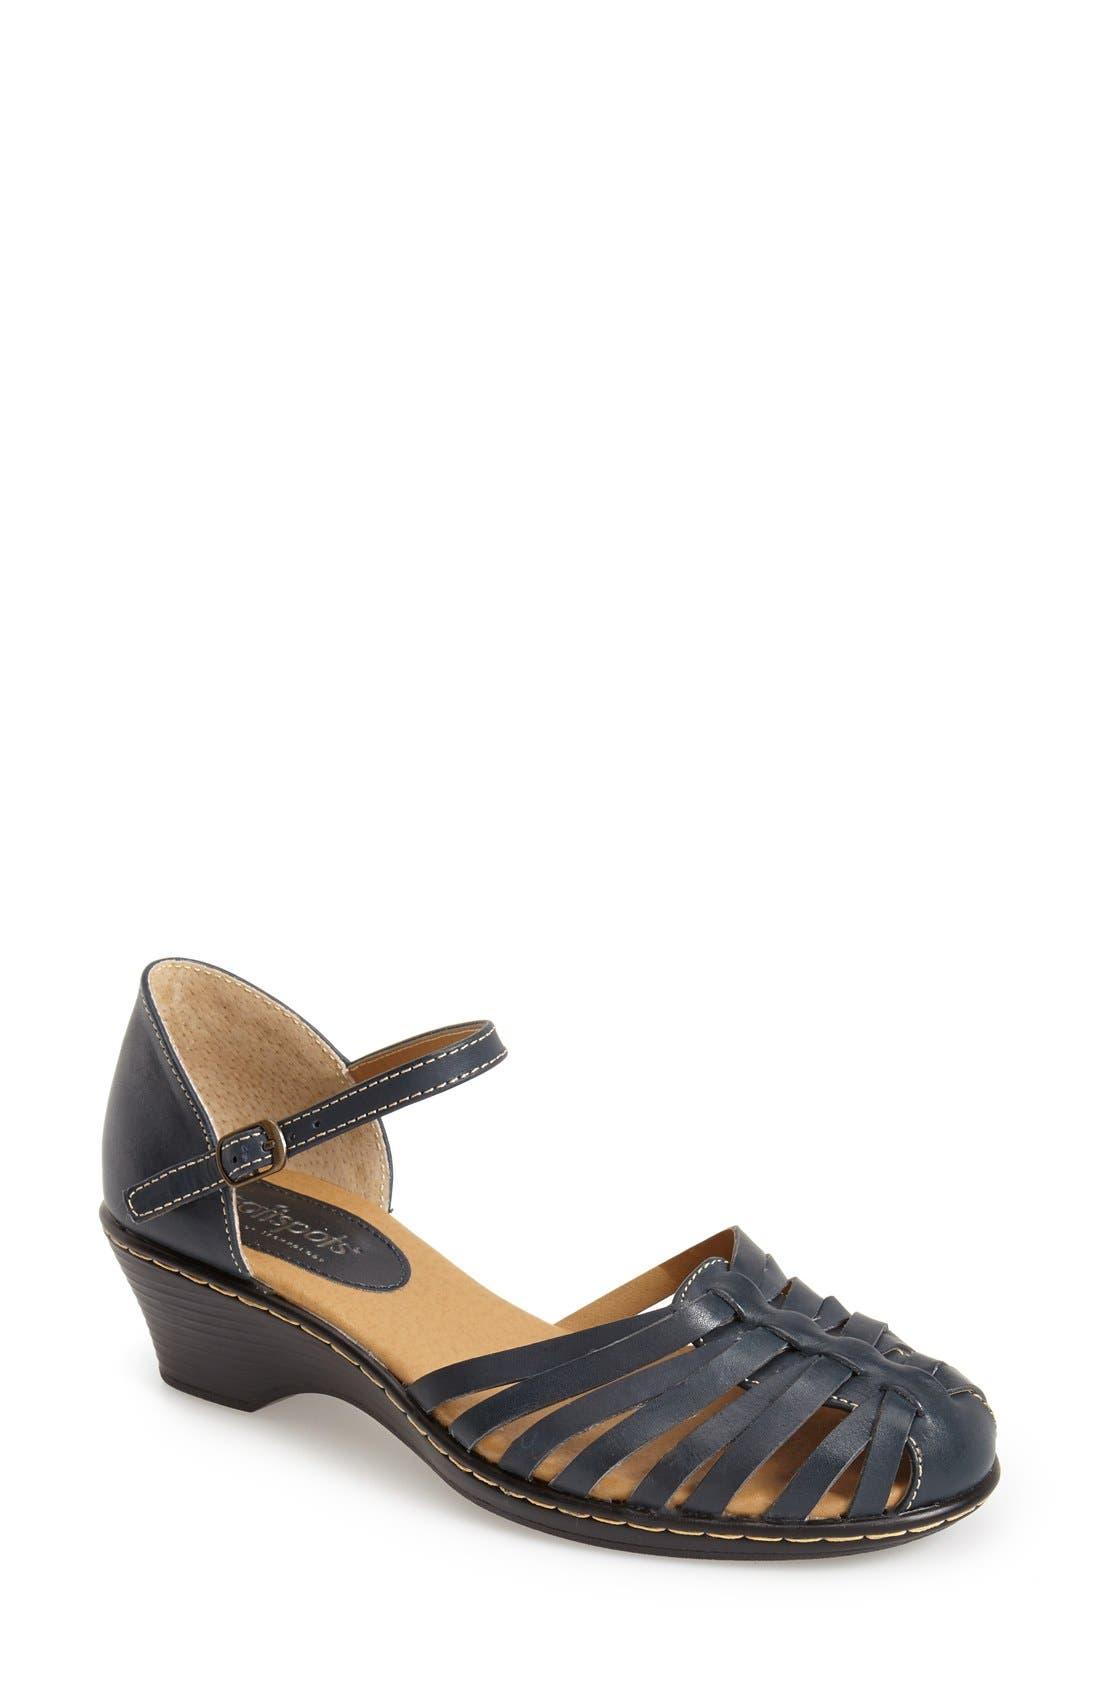 Alternate Image 1 Selected - Softspots 'Tatianna' Sandal